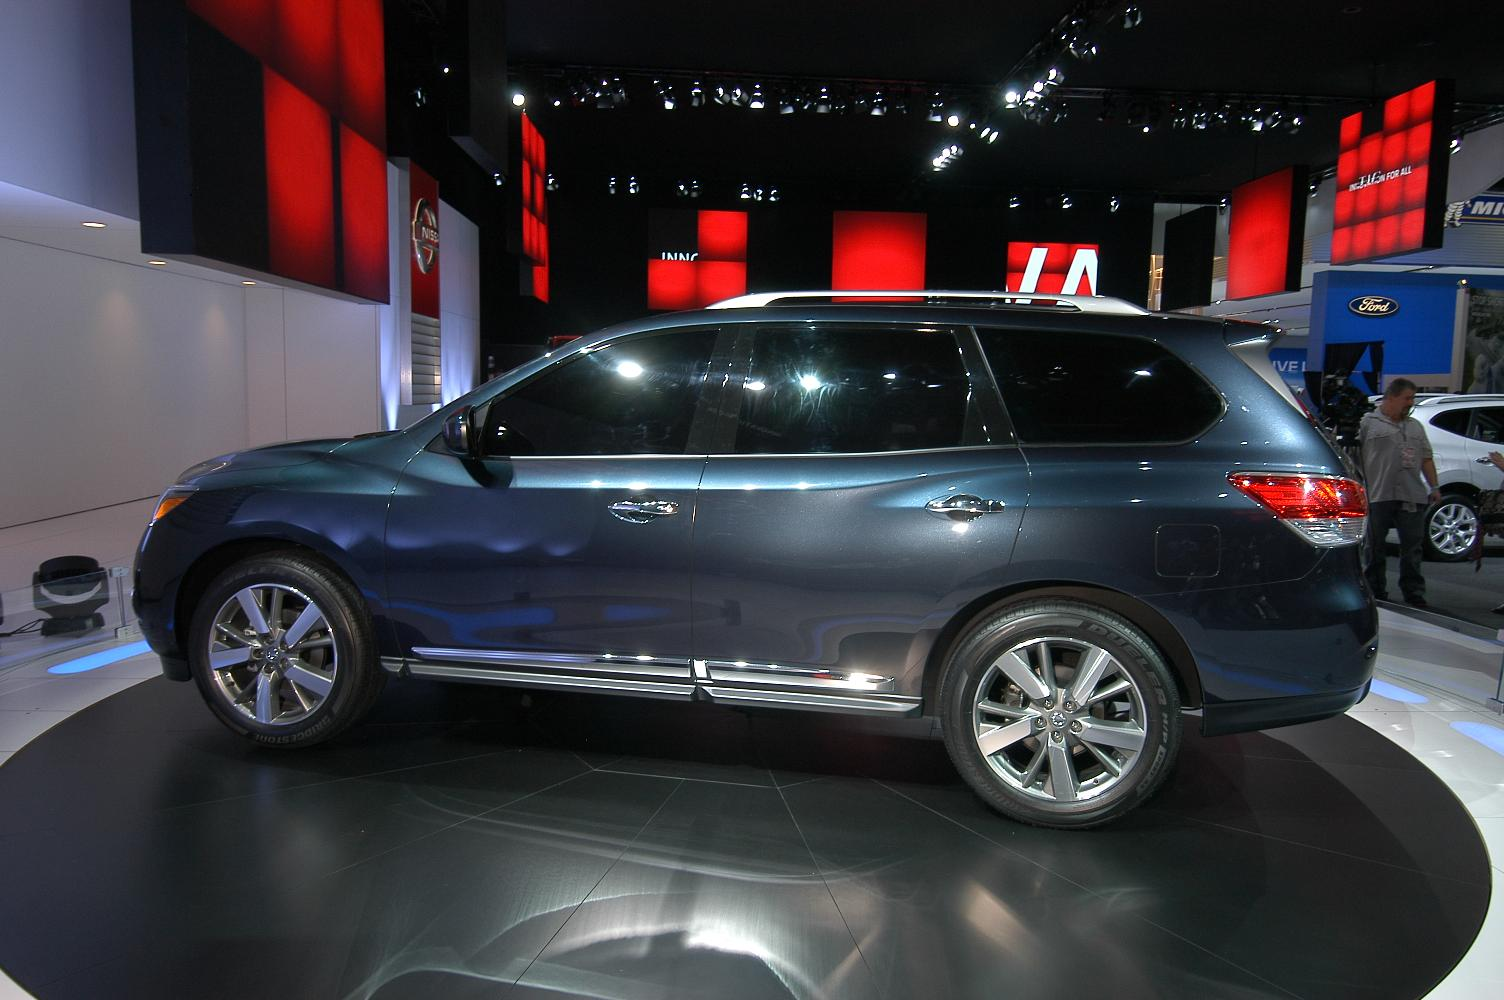 Nissan Pathfinder NAIAS 2012 2